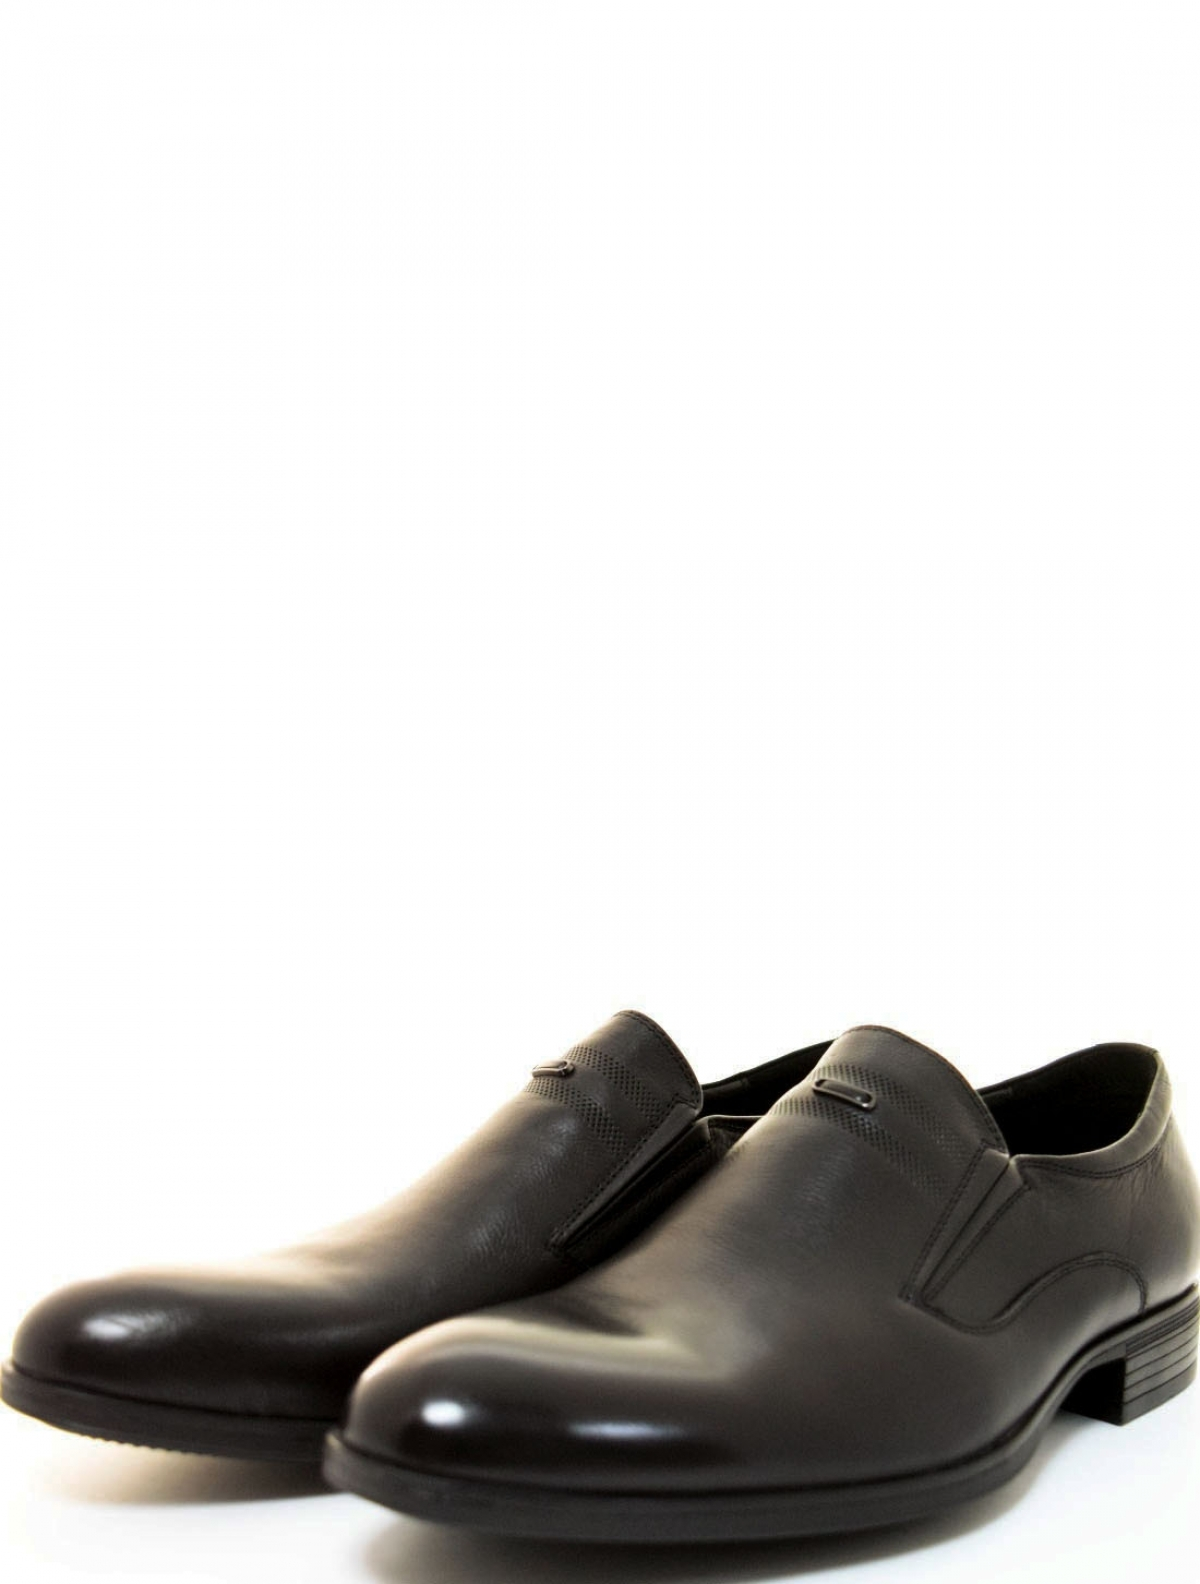 Roscote CF71-175-A383-T1918 мужские туфли